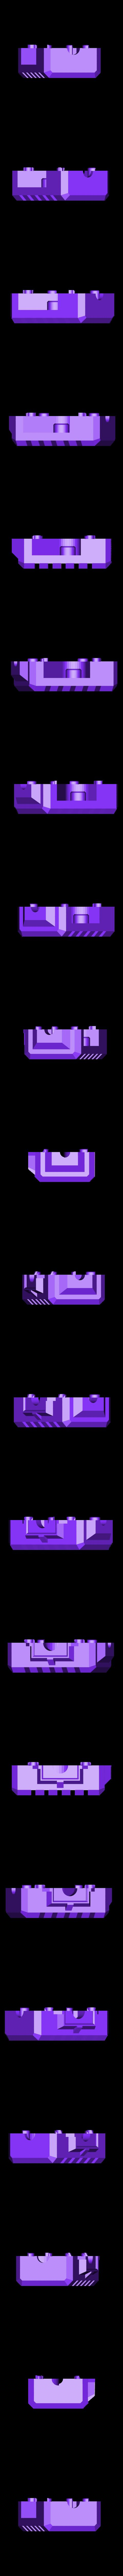 L_shoulder_2_of_2.stl Download free STL file TRANSORMERS G1 Metroplex Re-creation Add-on • Model to 3D print, sickofyou